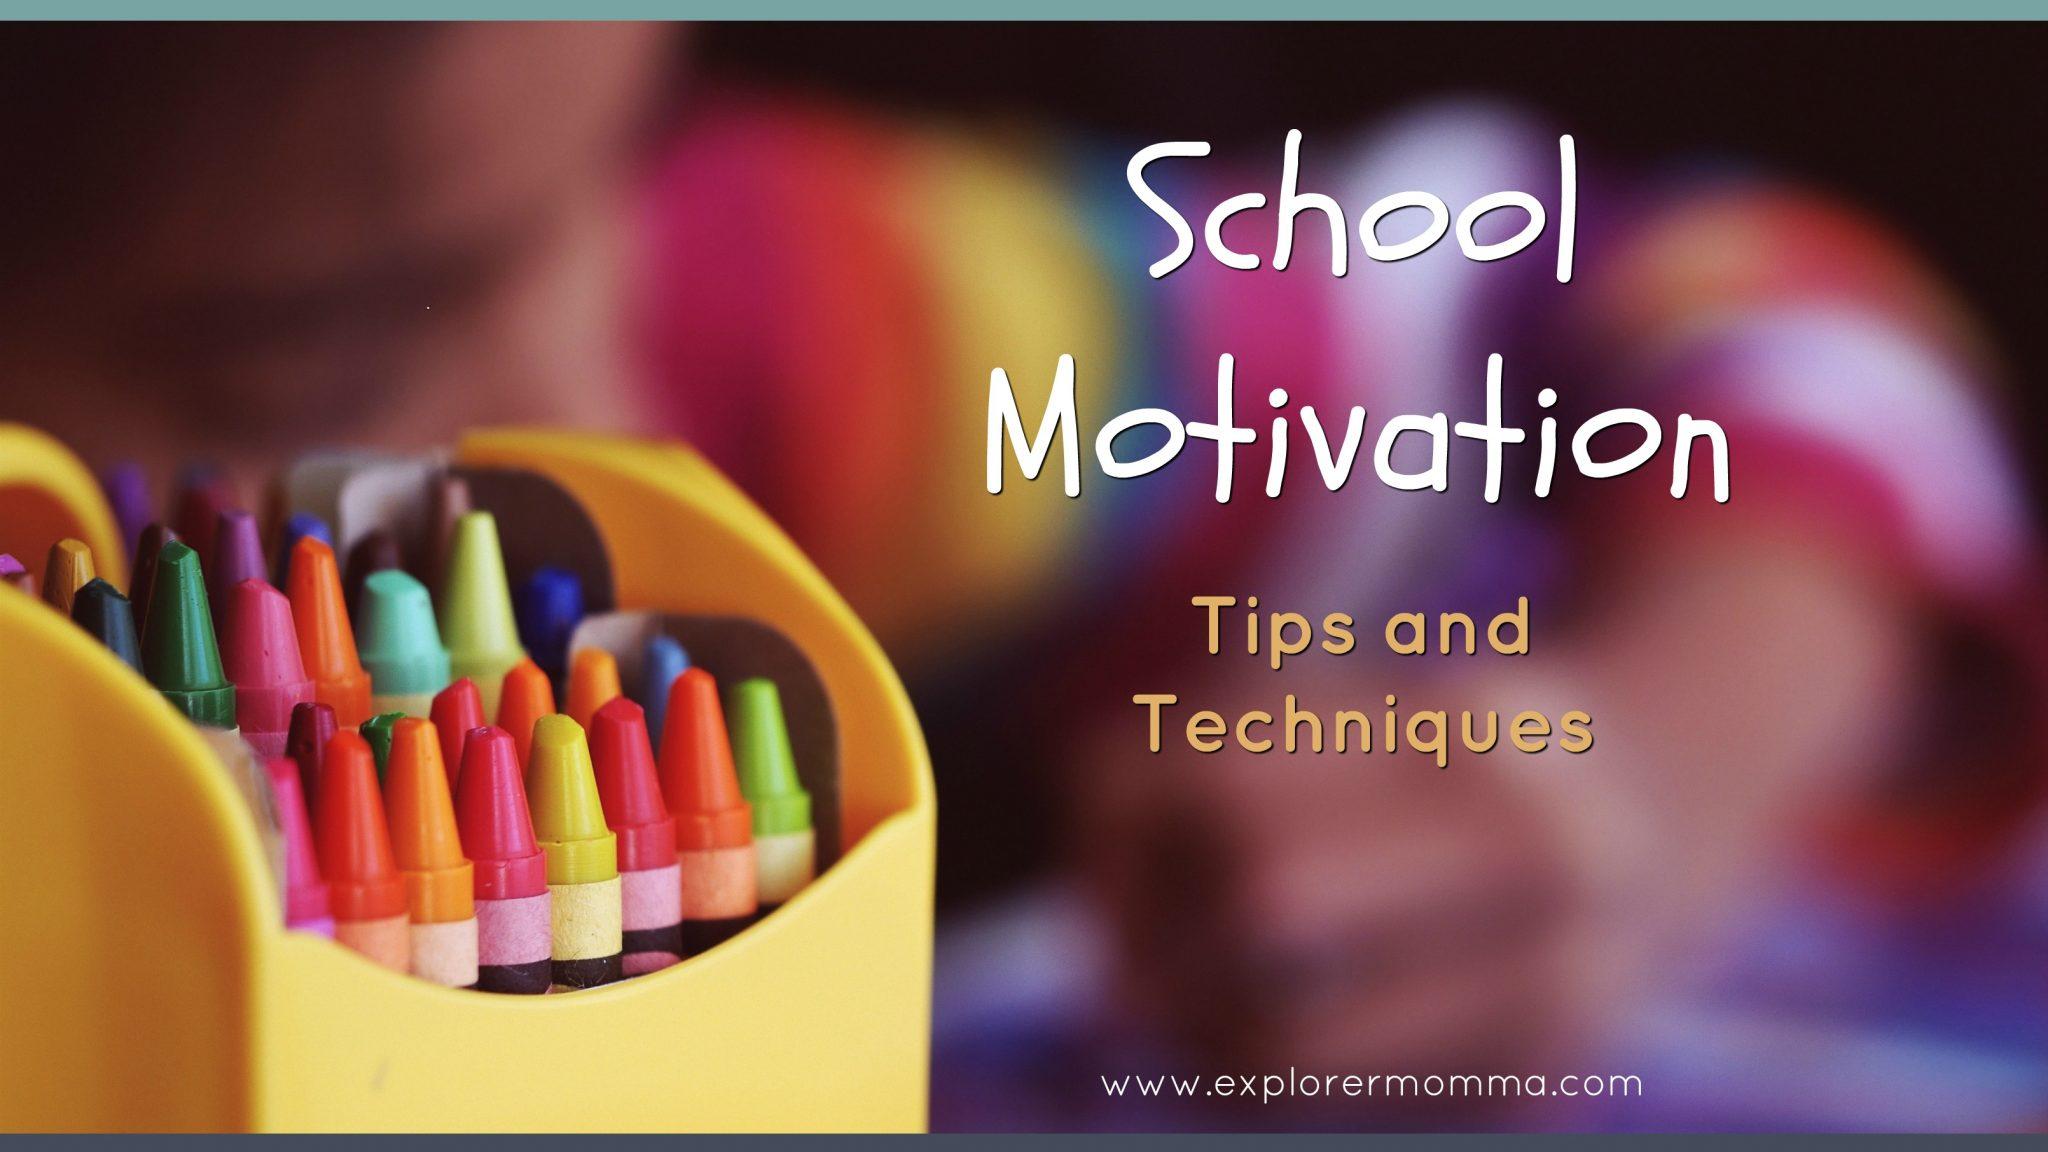 School motivation feature